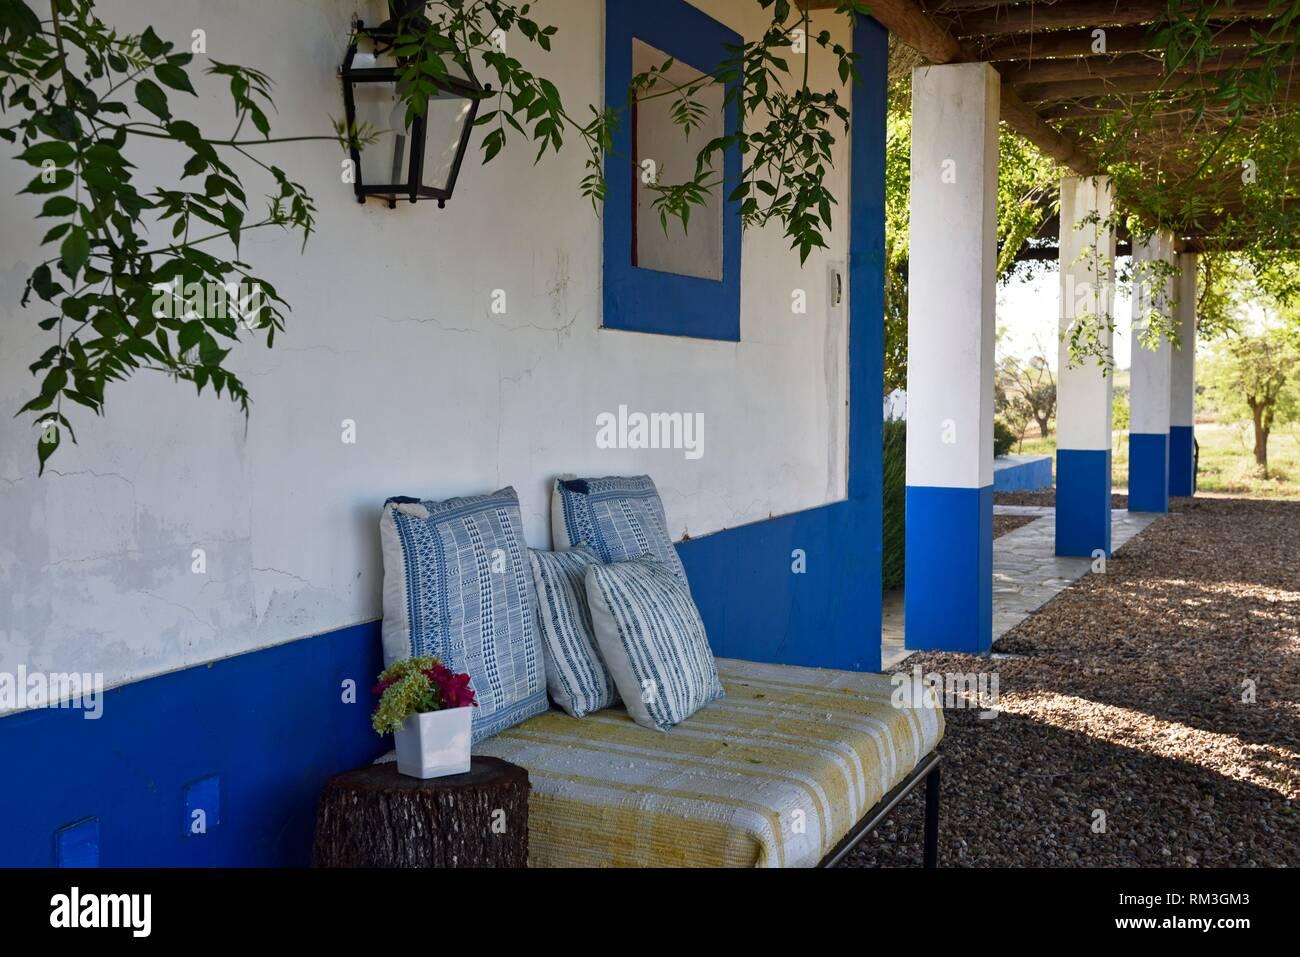 veranda, Vale do Manantio Estate, Moura, Alentejo region, Portugal, southwertern Europe. - Stock Image